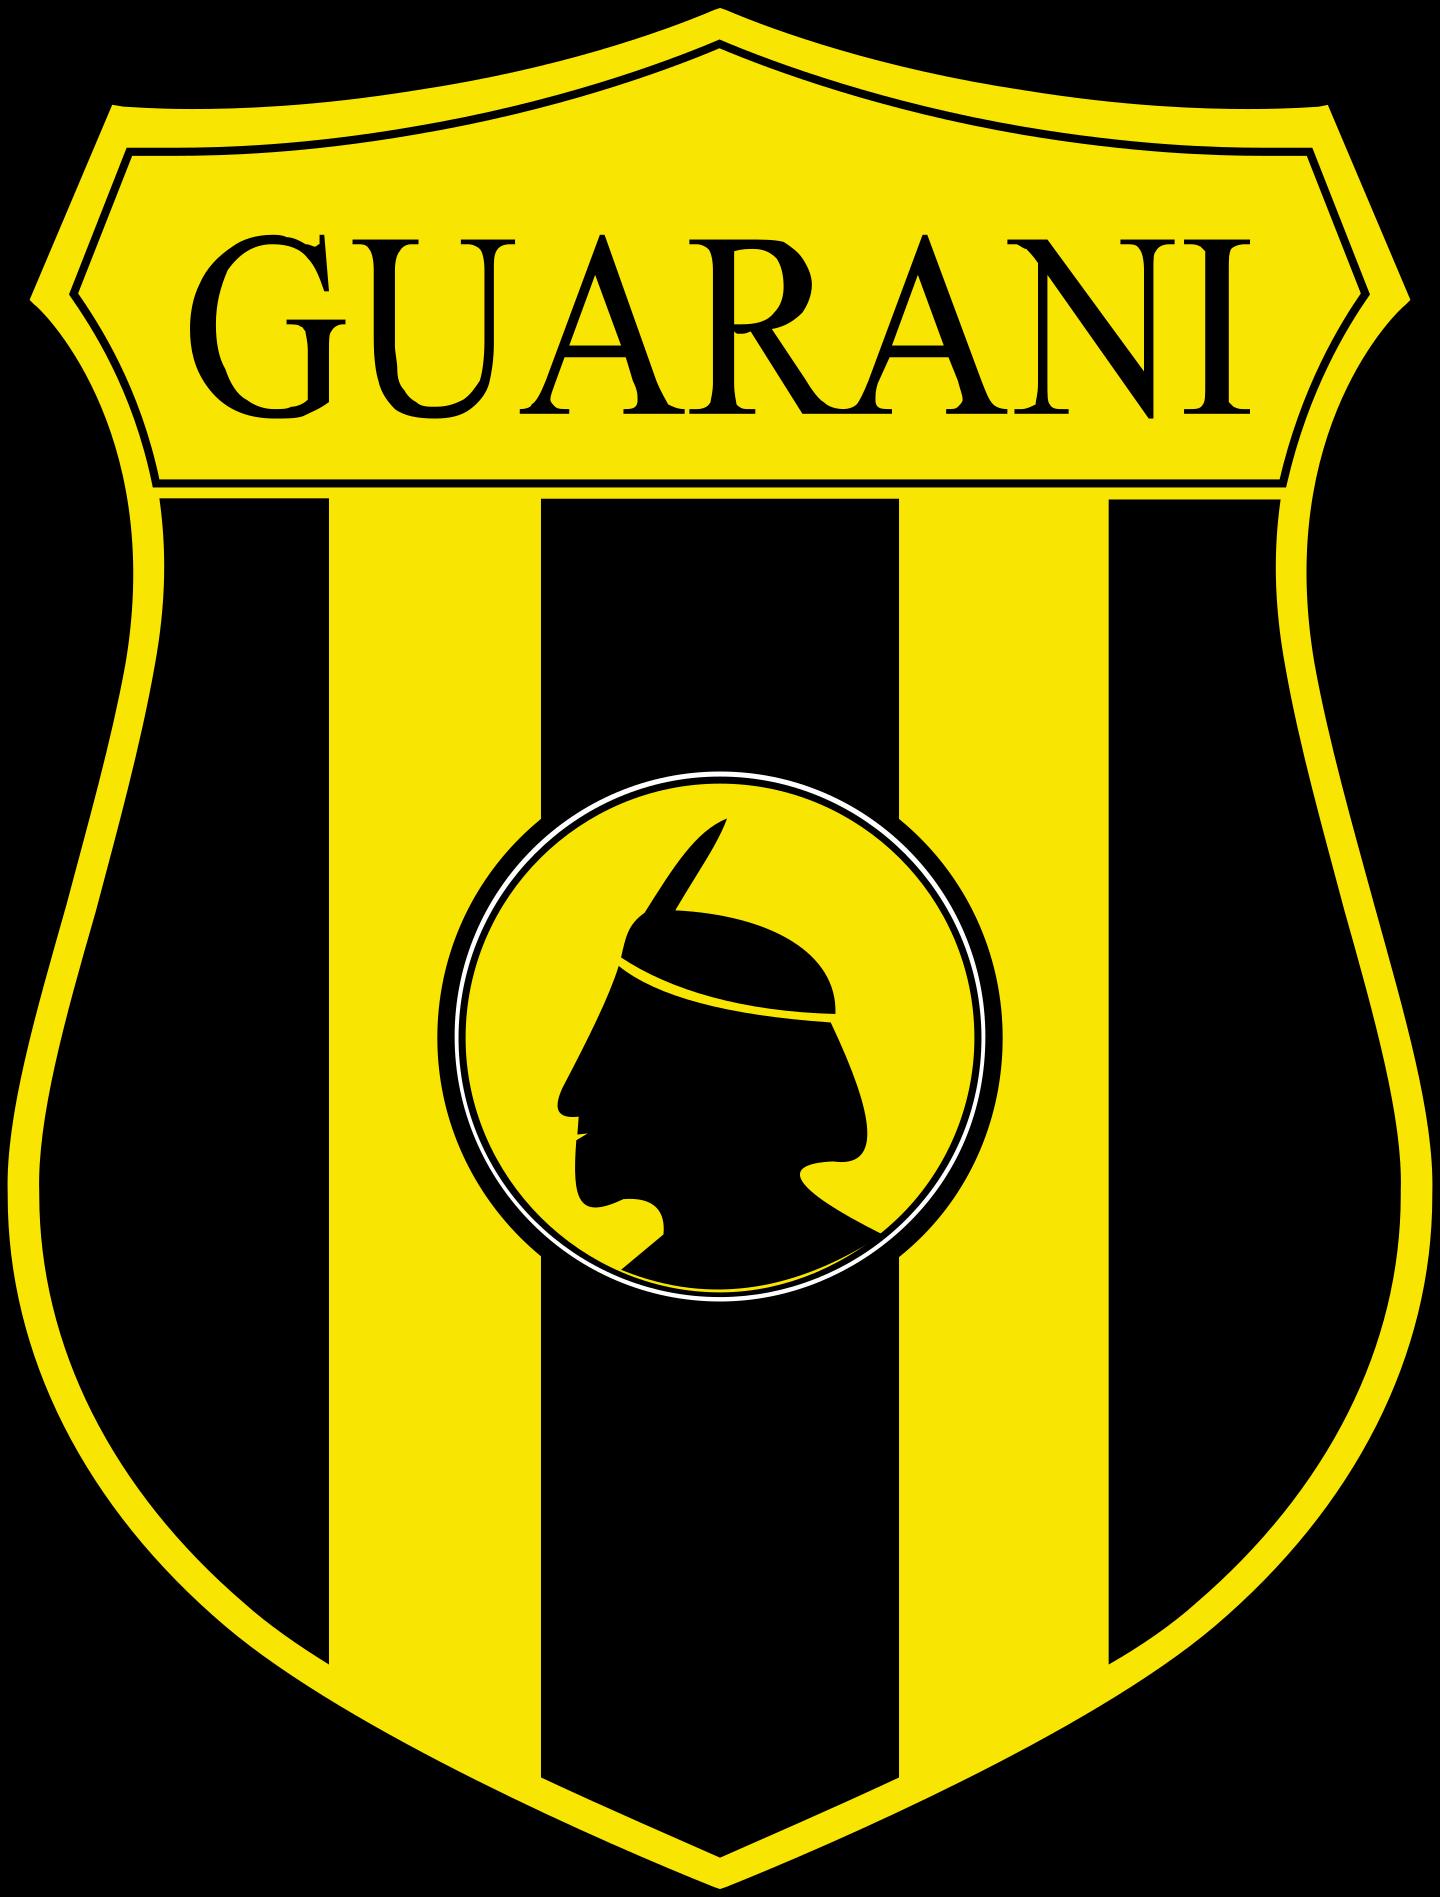 club guarani logo 2 - Club Guaraní Logo